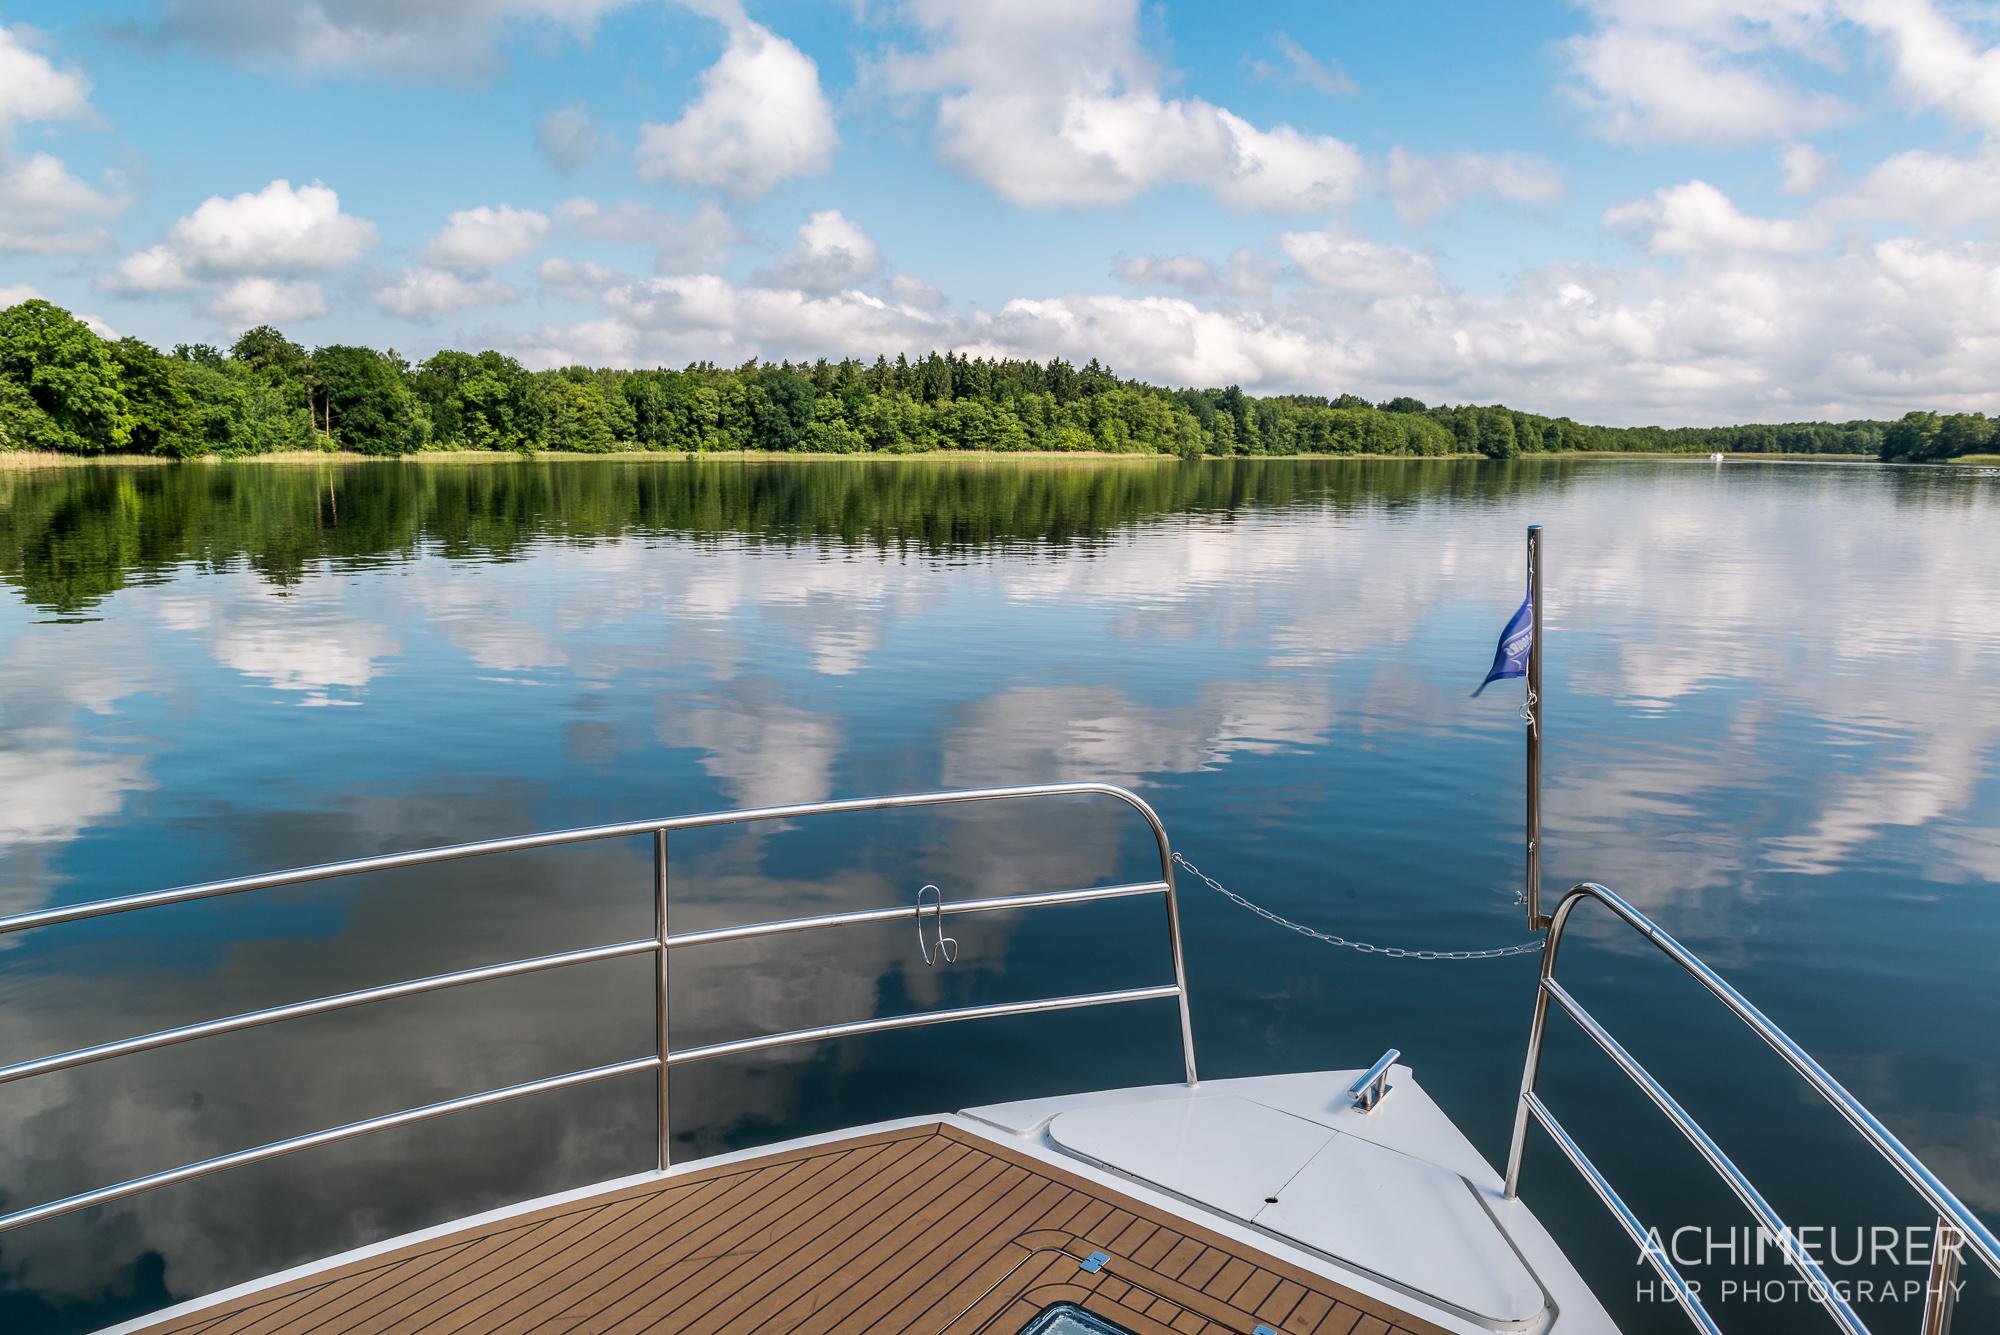 Hausboot-Kuhnle-Mueritz-Mecklenburg-Vorpommern-See_2821